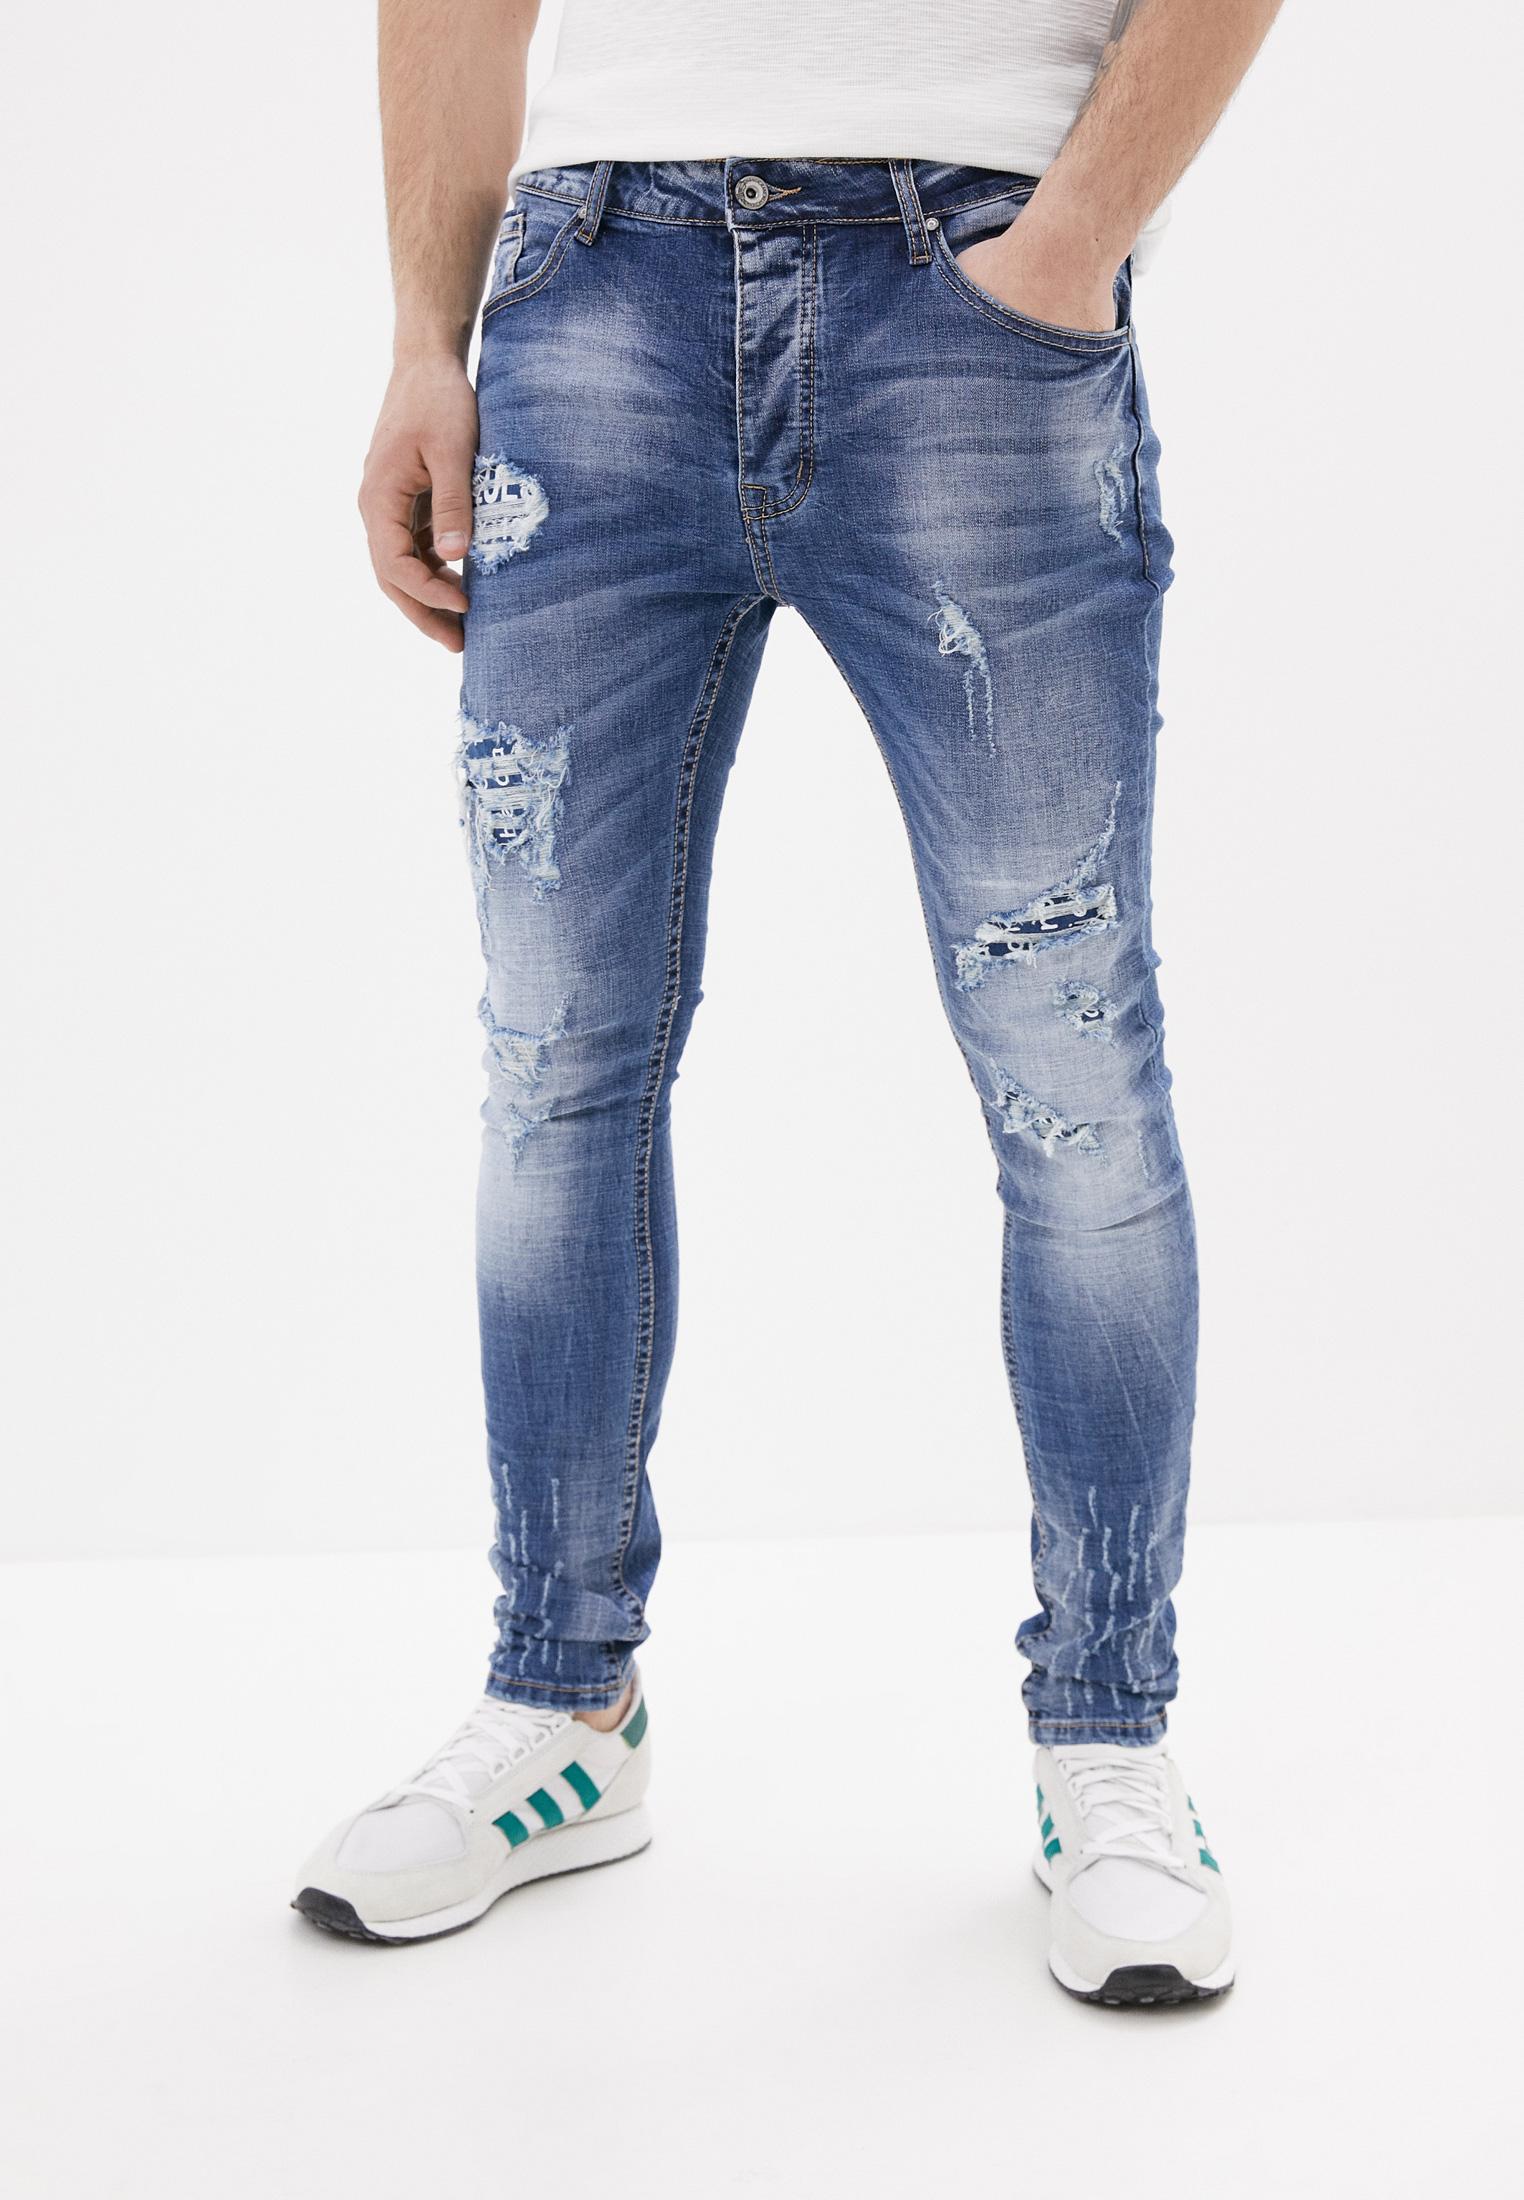 Зауженные джинсы Terance Kole 66100